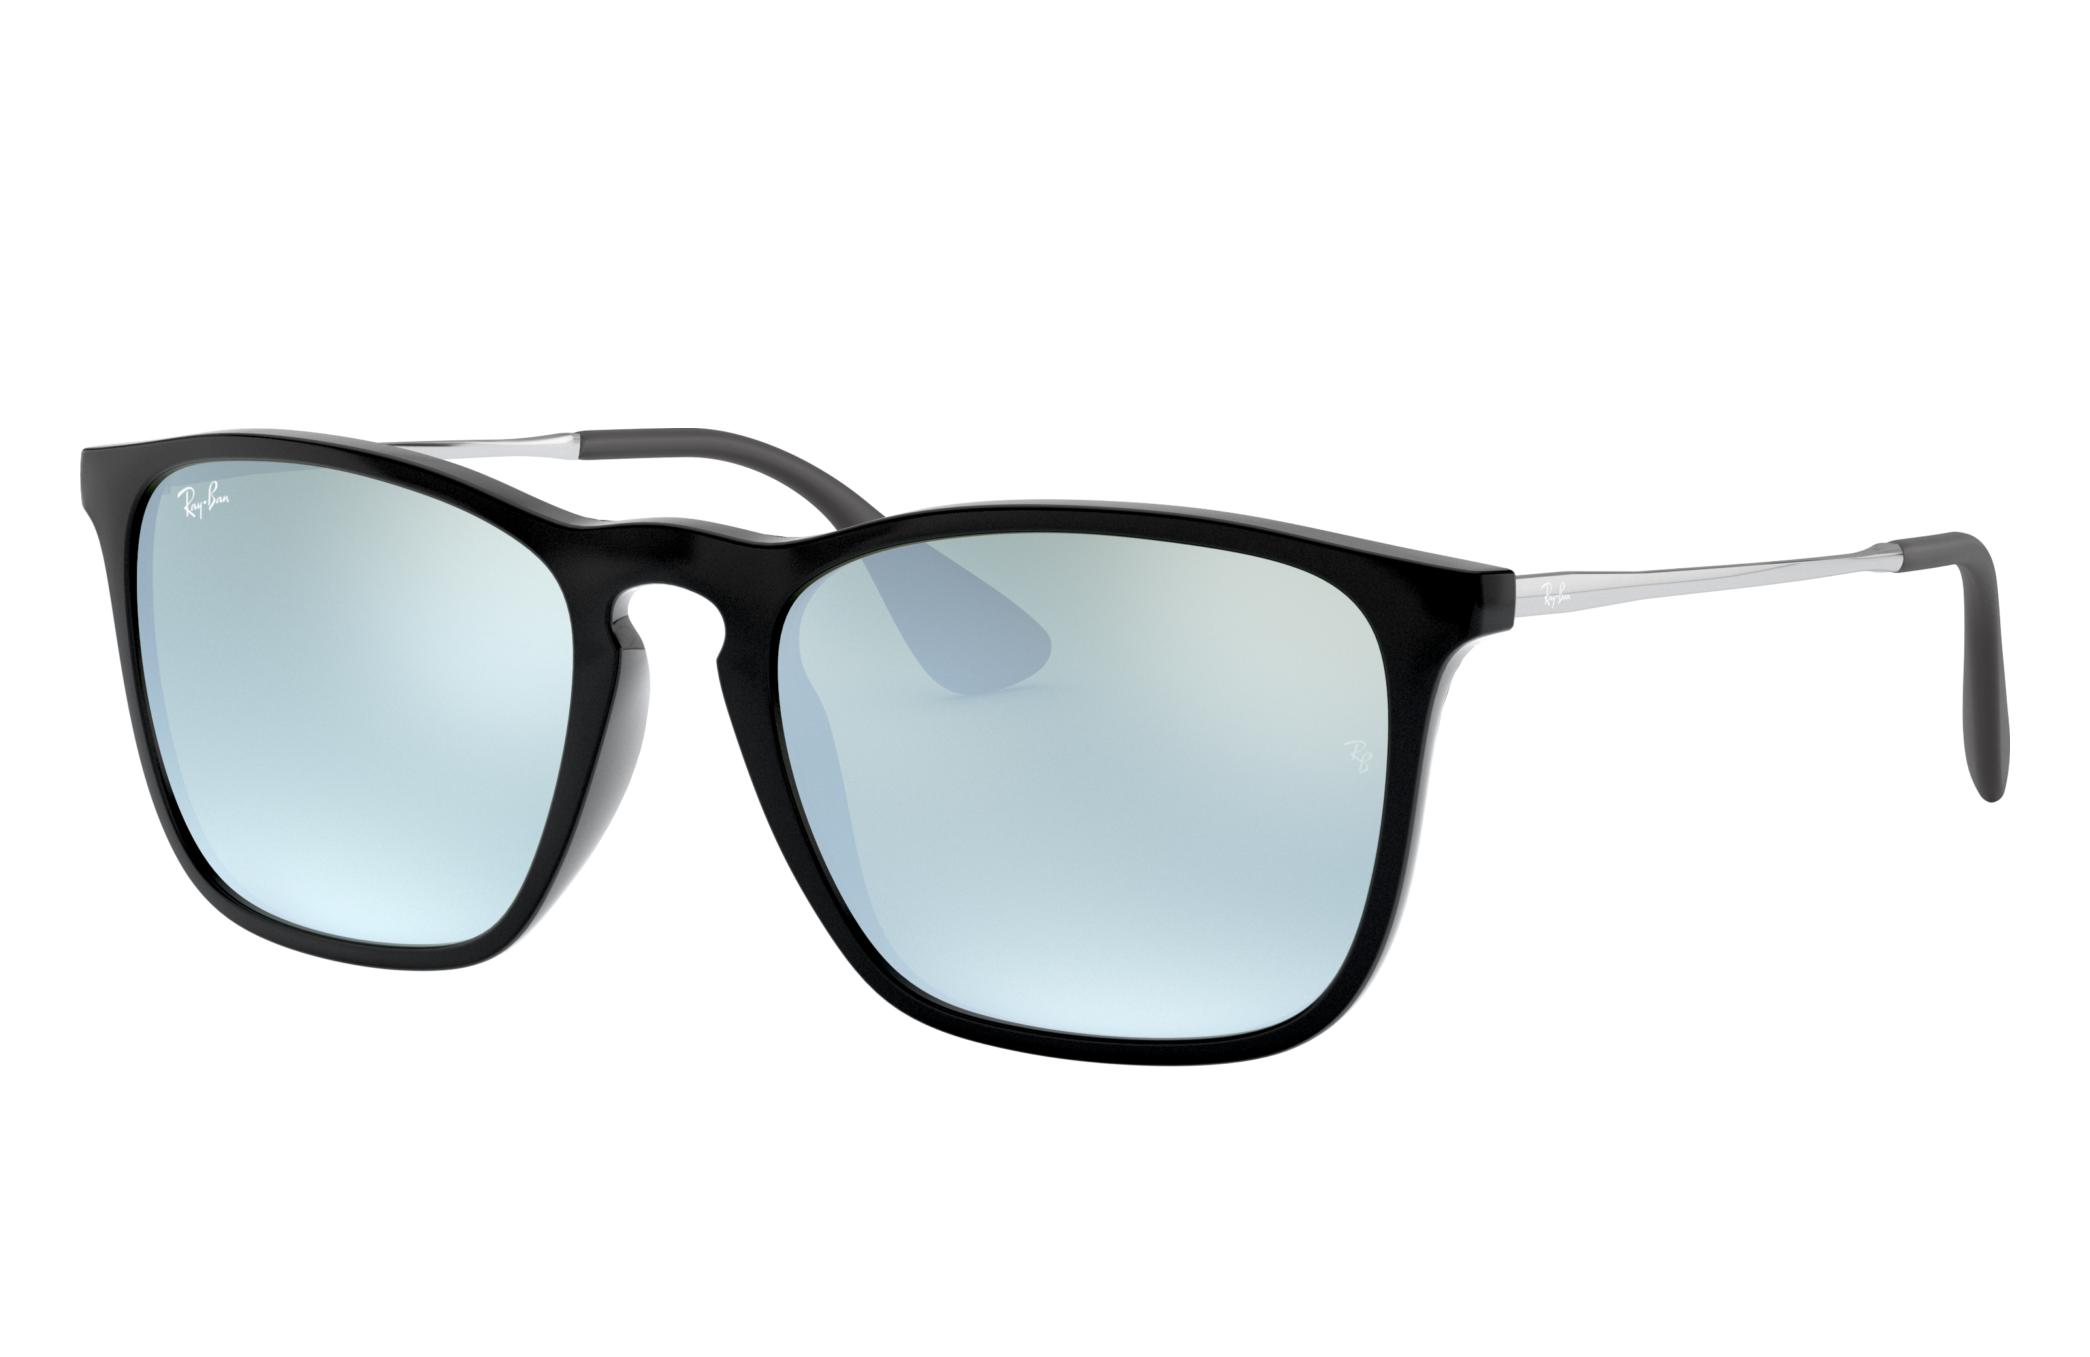 Ray-Ban Chris Gunmetal, Gray Lenses - RB4187